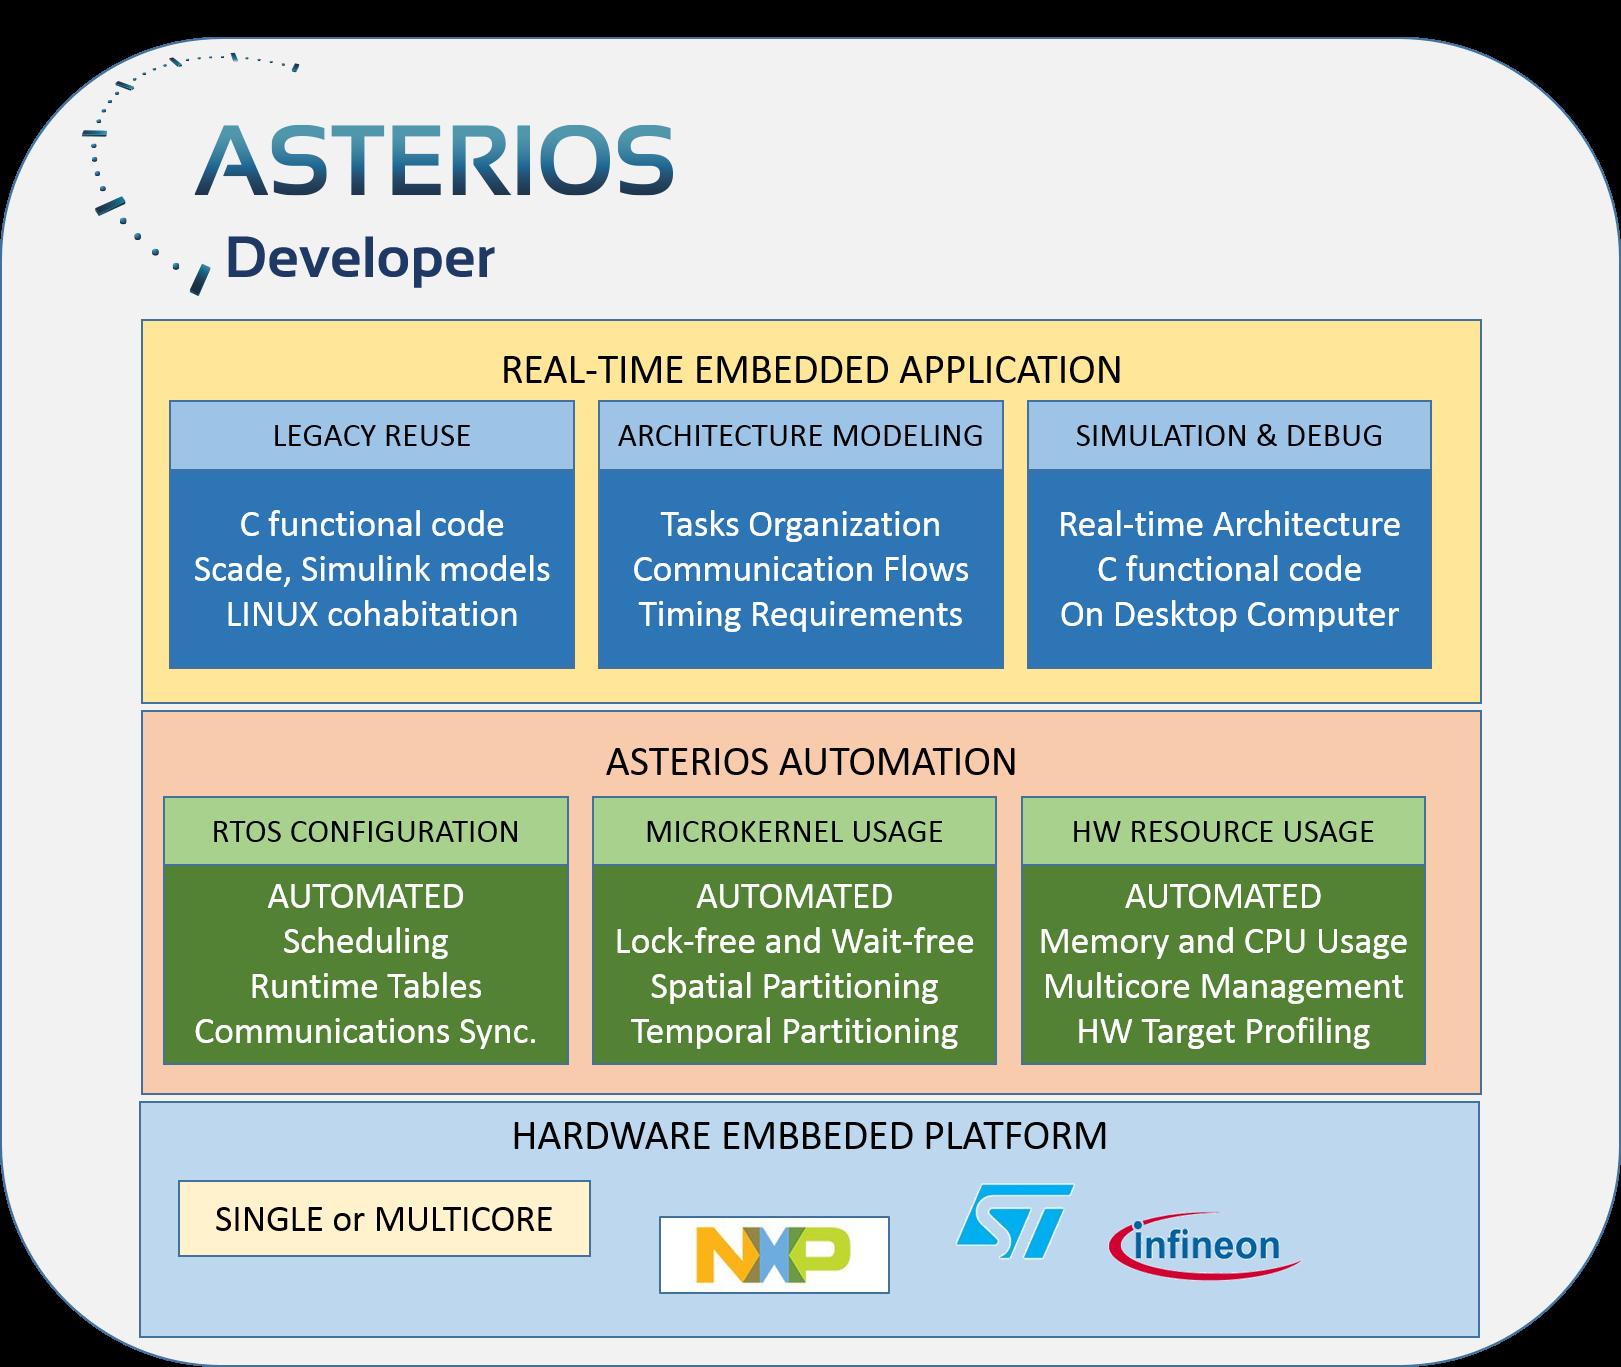 P4_ASTERIOS_Developer